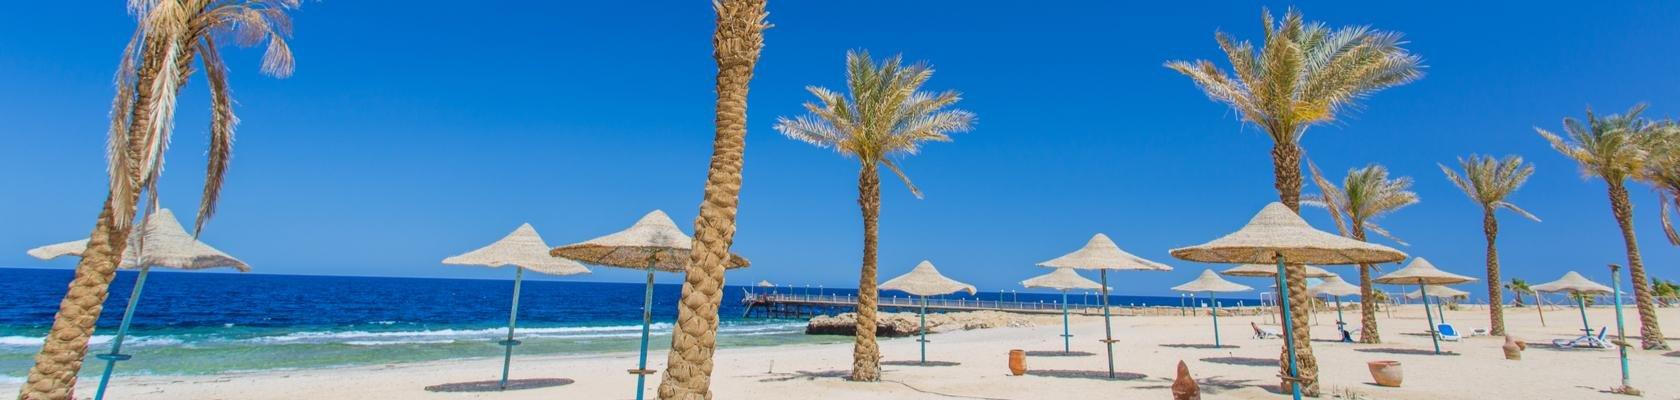 Zon, zee en strand in Hurghada